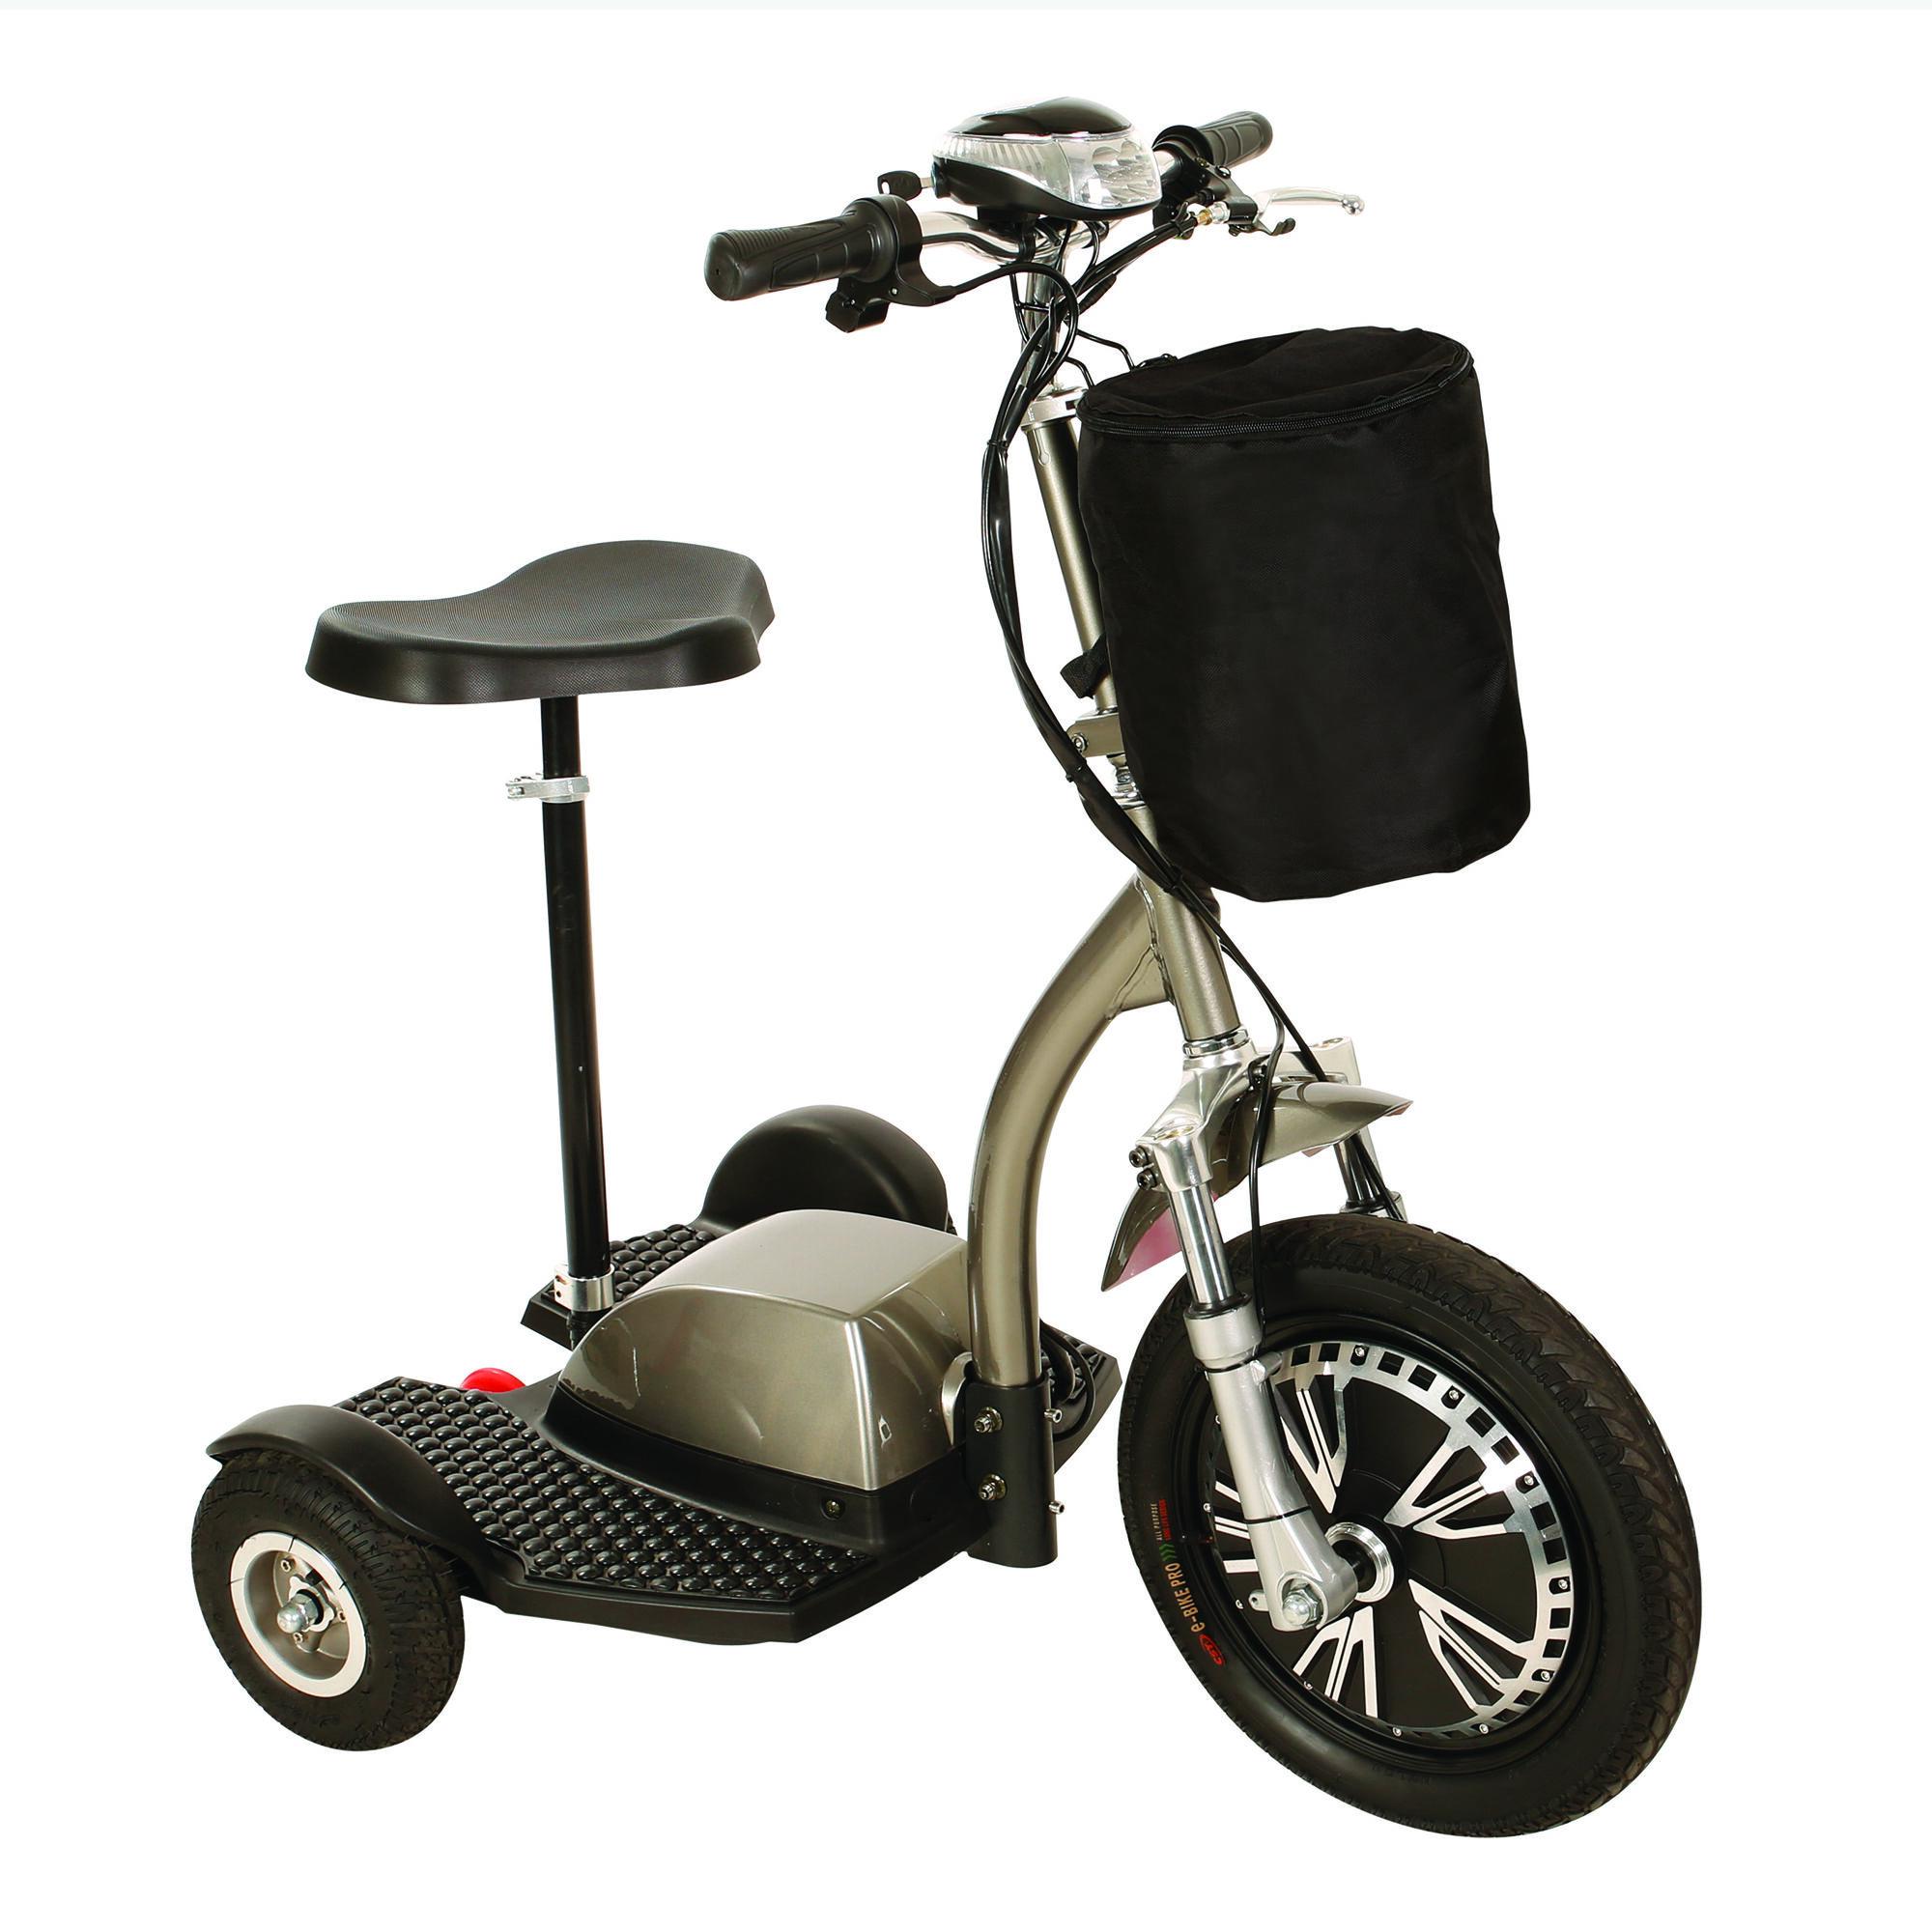 scooter tow harnes [ 1000 x 1000 Pixel ]